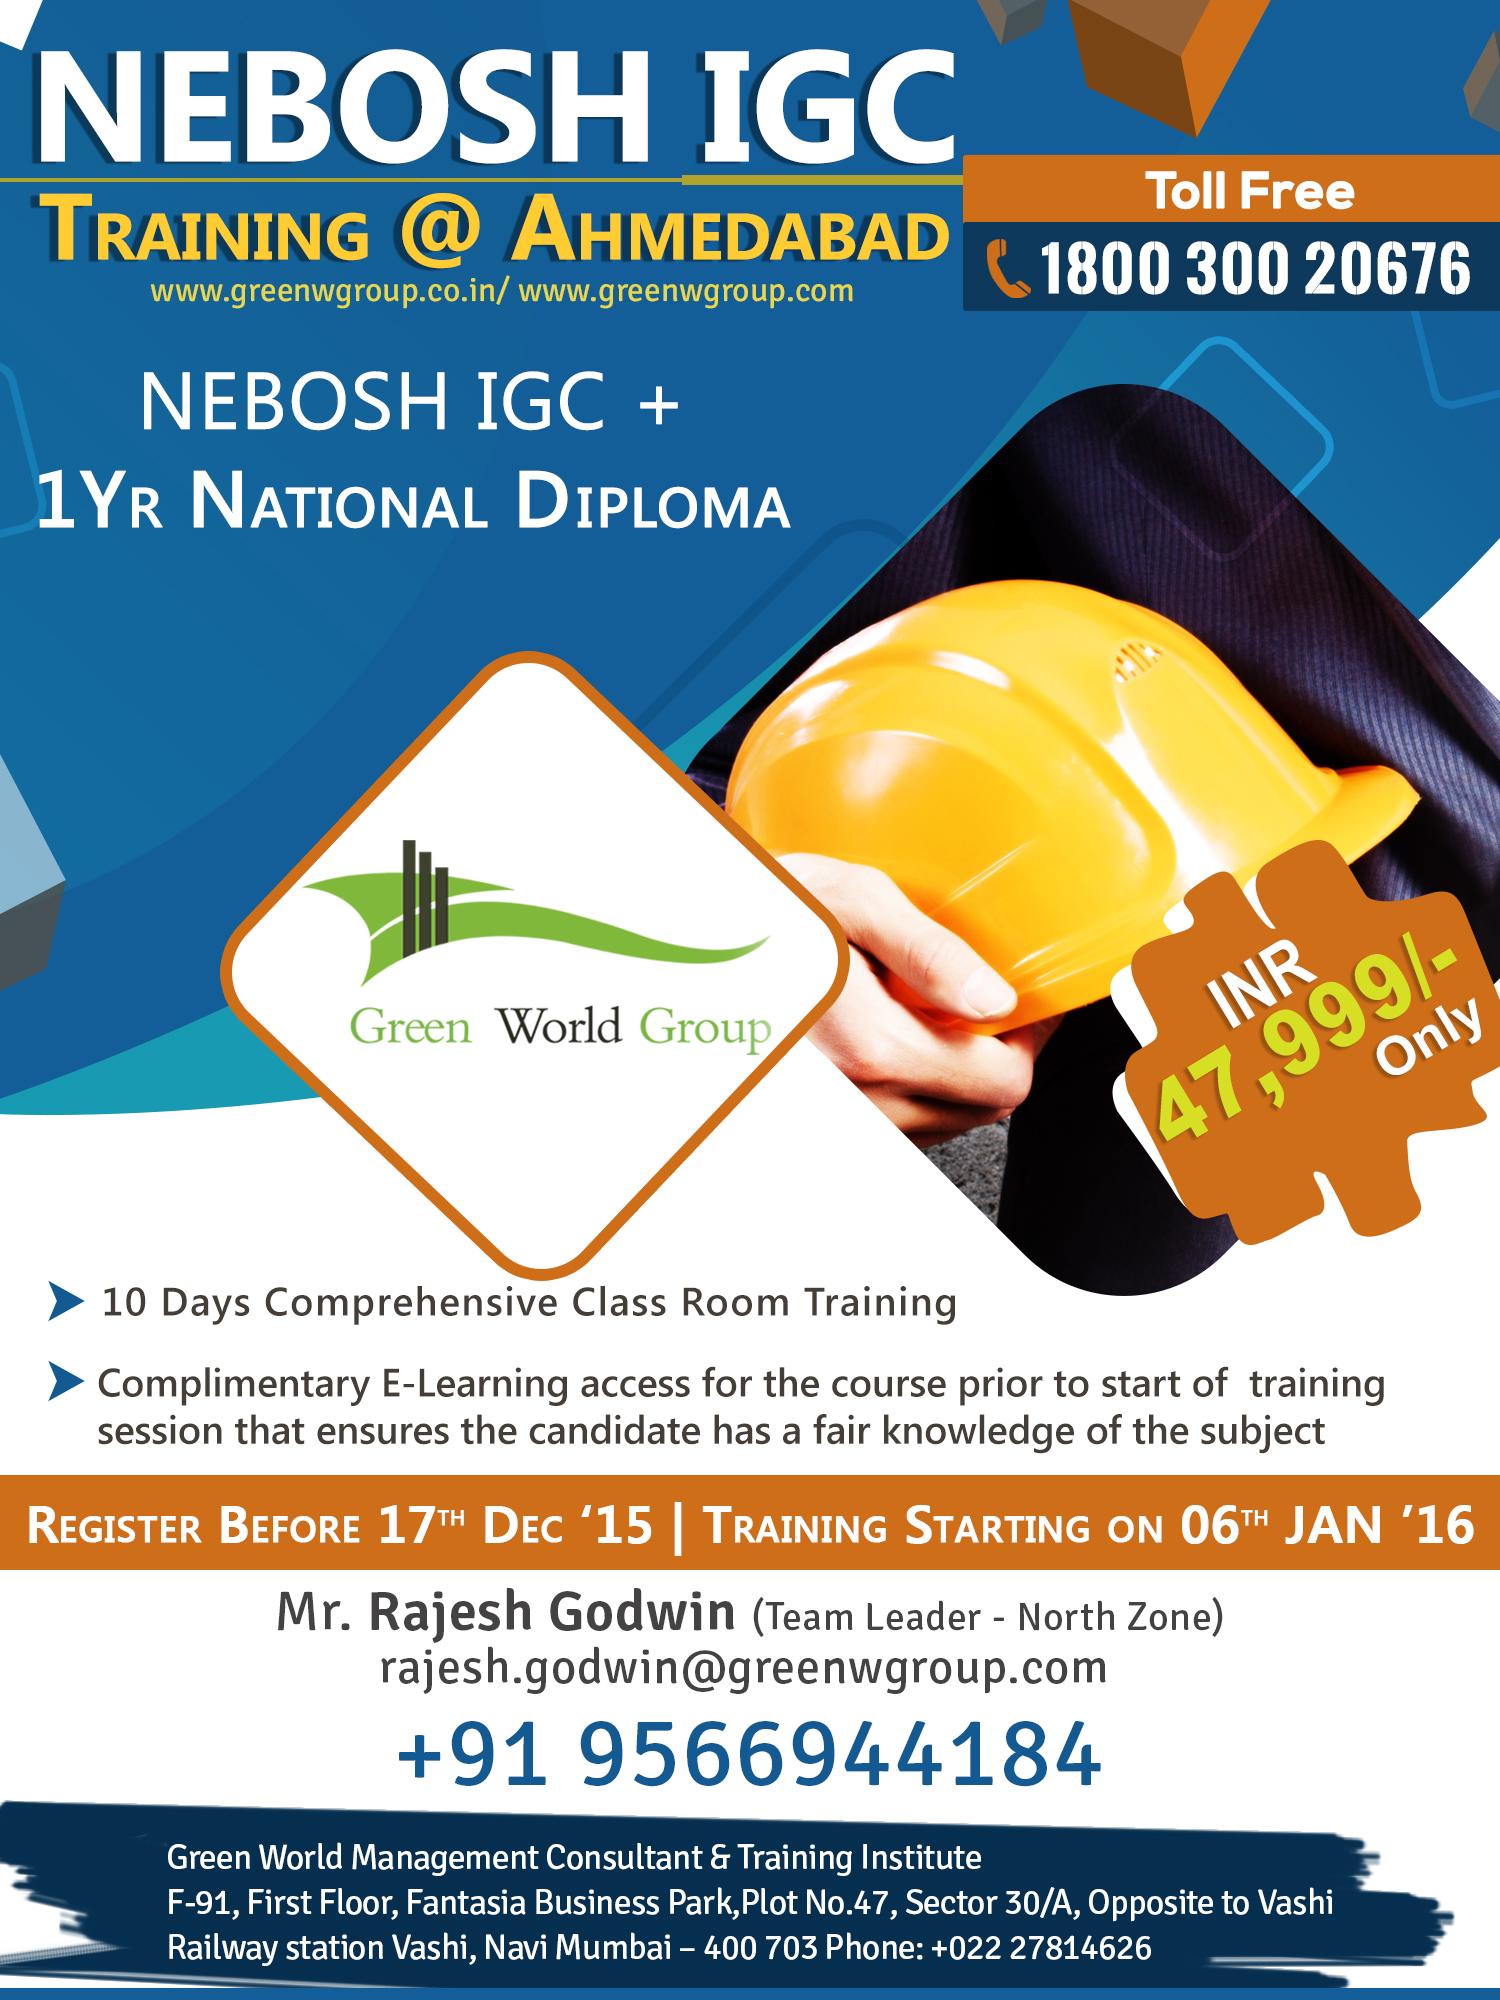 NEBOSH-IGC_Ahmedabad_Nov24